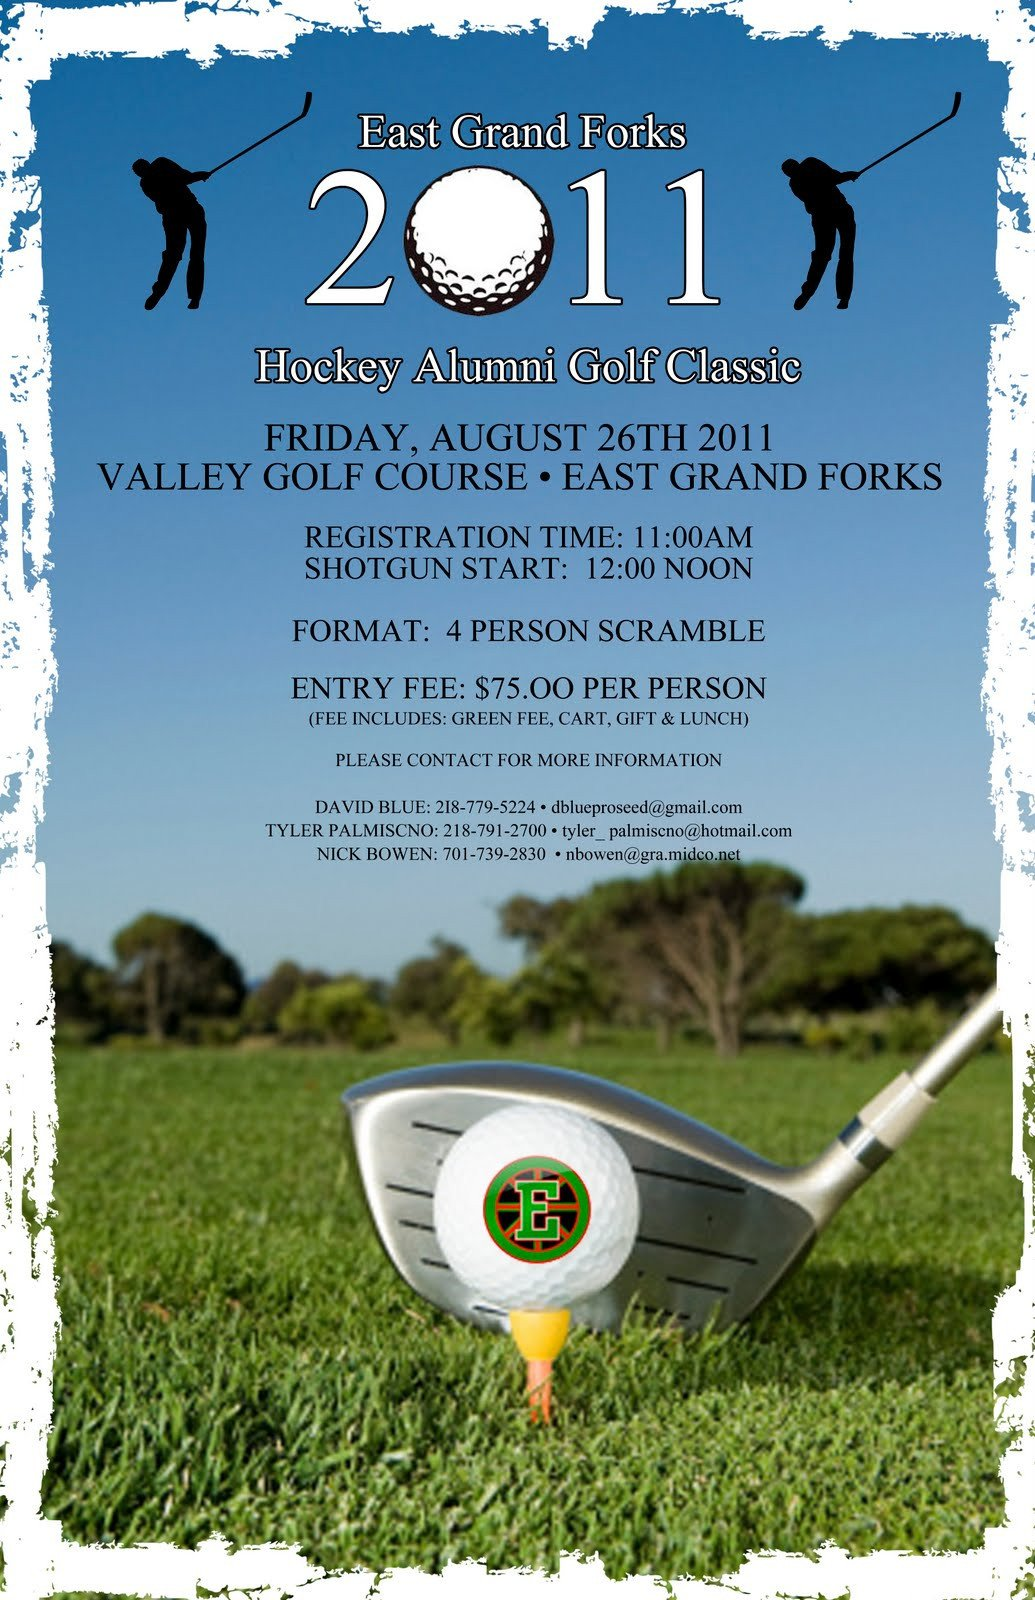 Golf tournament Flyer Templates East Grand forks Greenwave Hockey Golf tournament